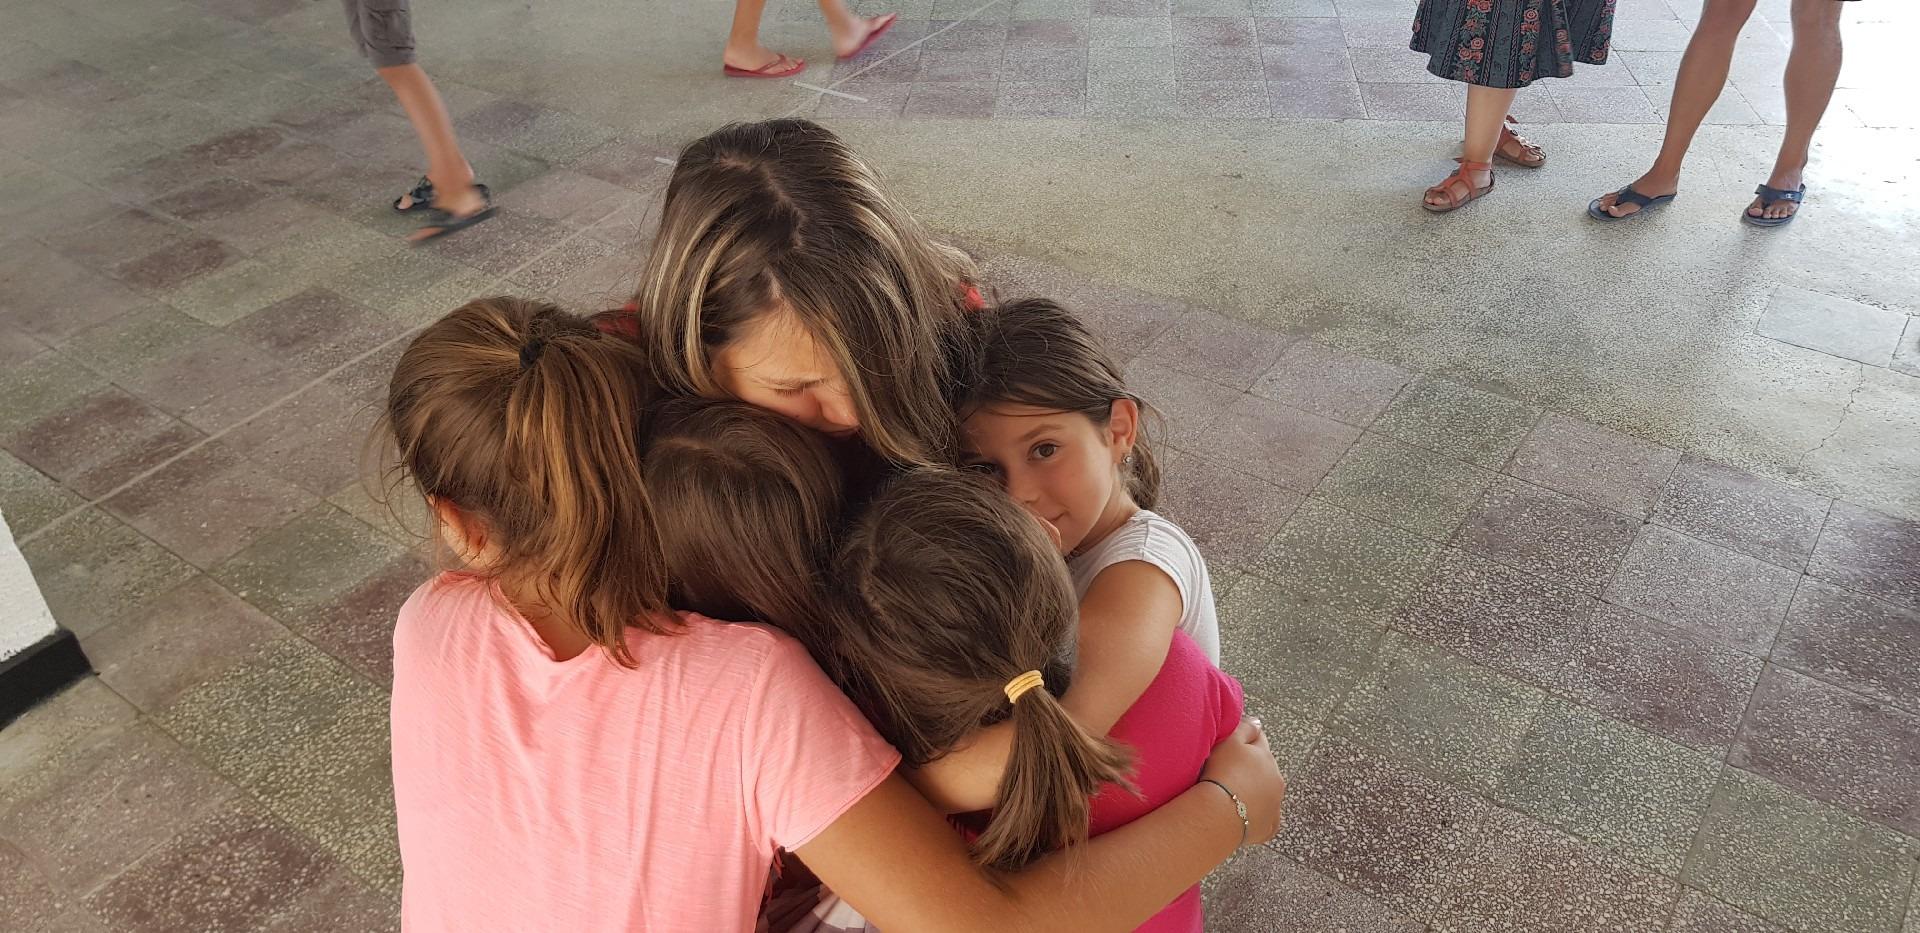 summer language camp in Bulgaria Z camp, Day 35 - group hug of girls